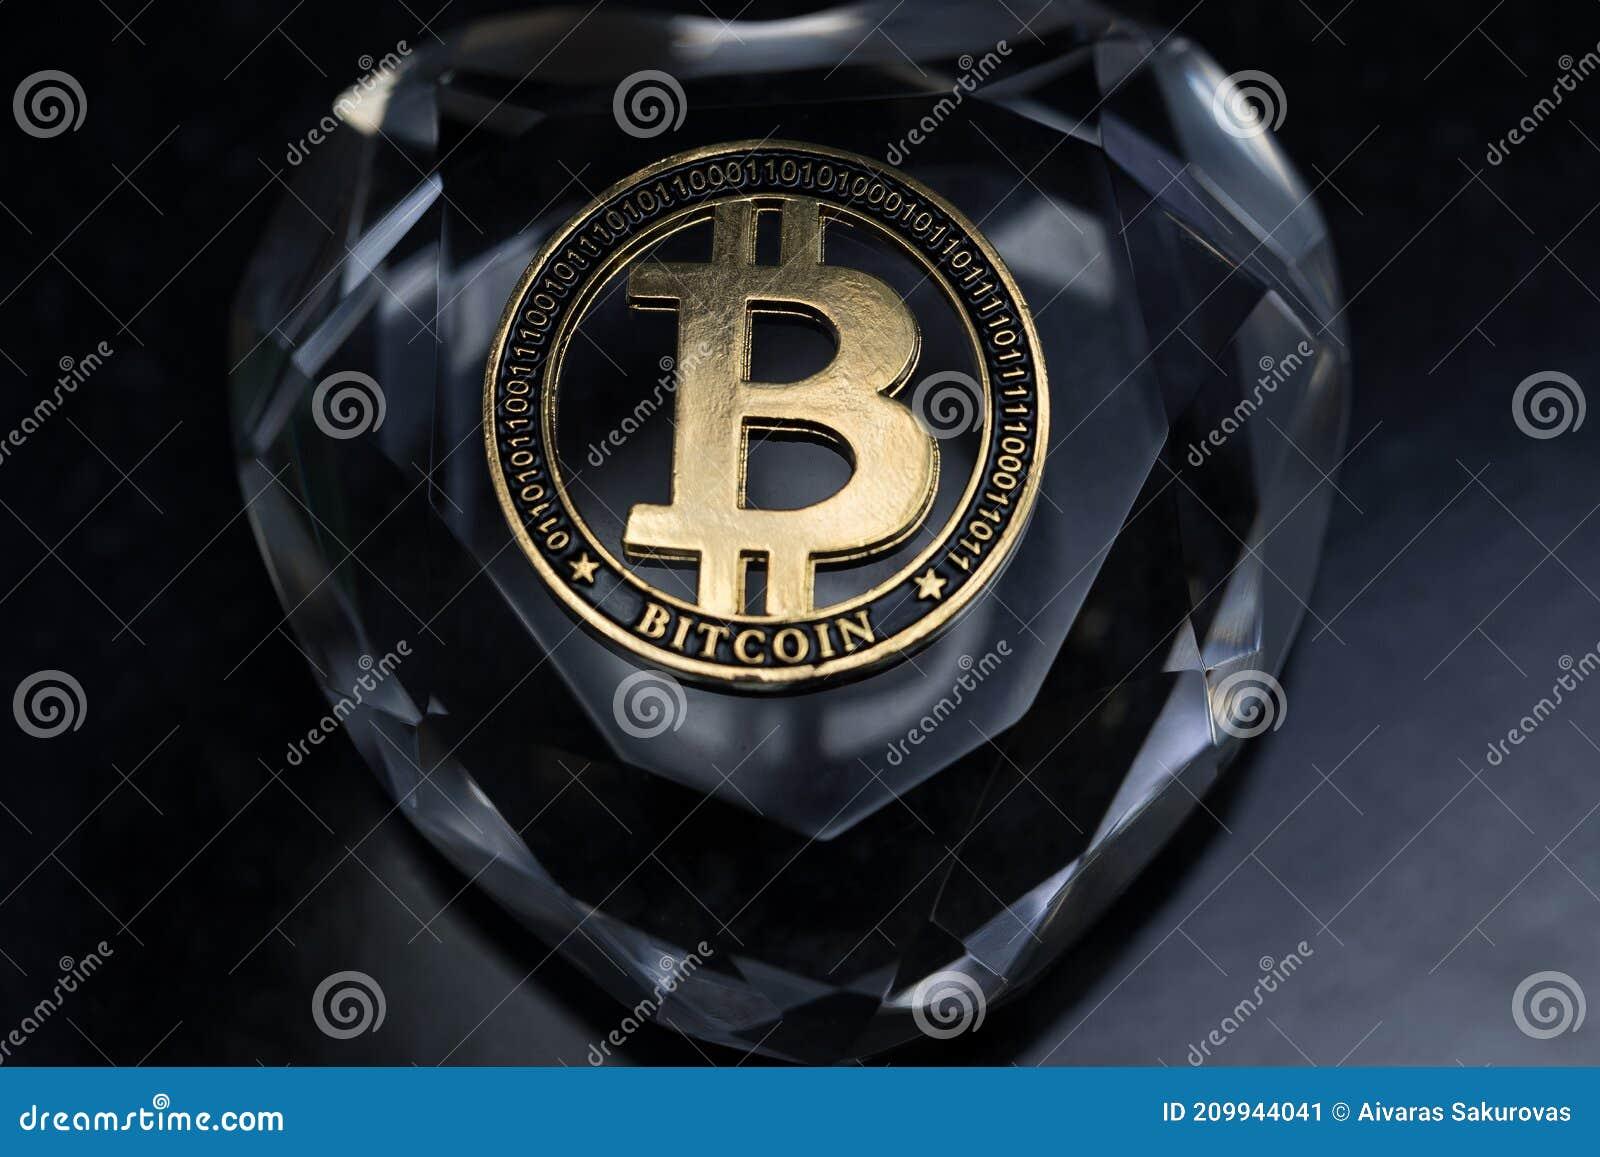 bitcoin mainnet